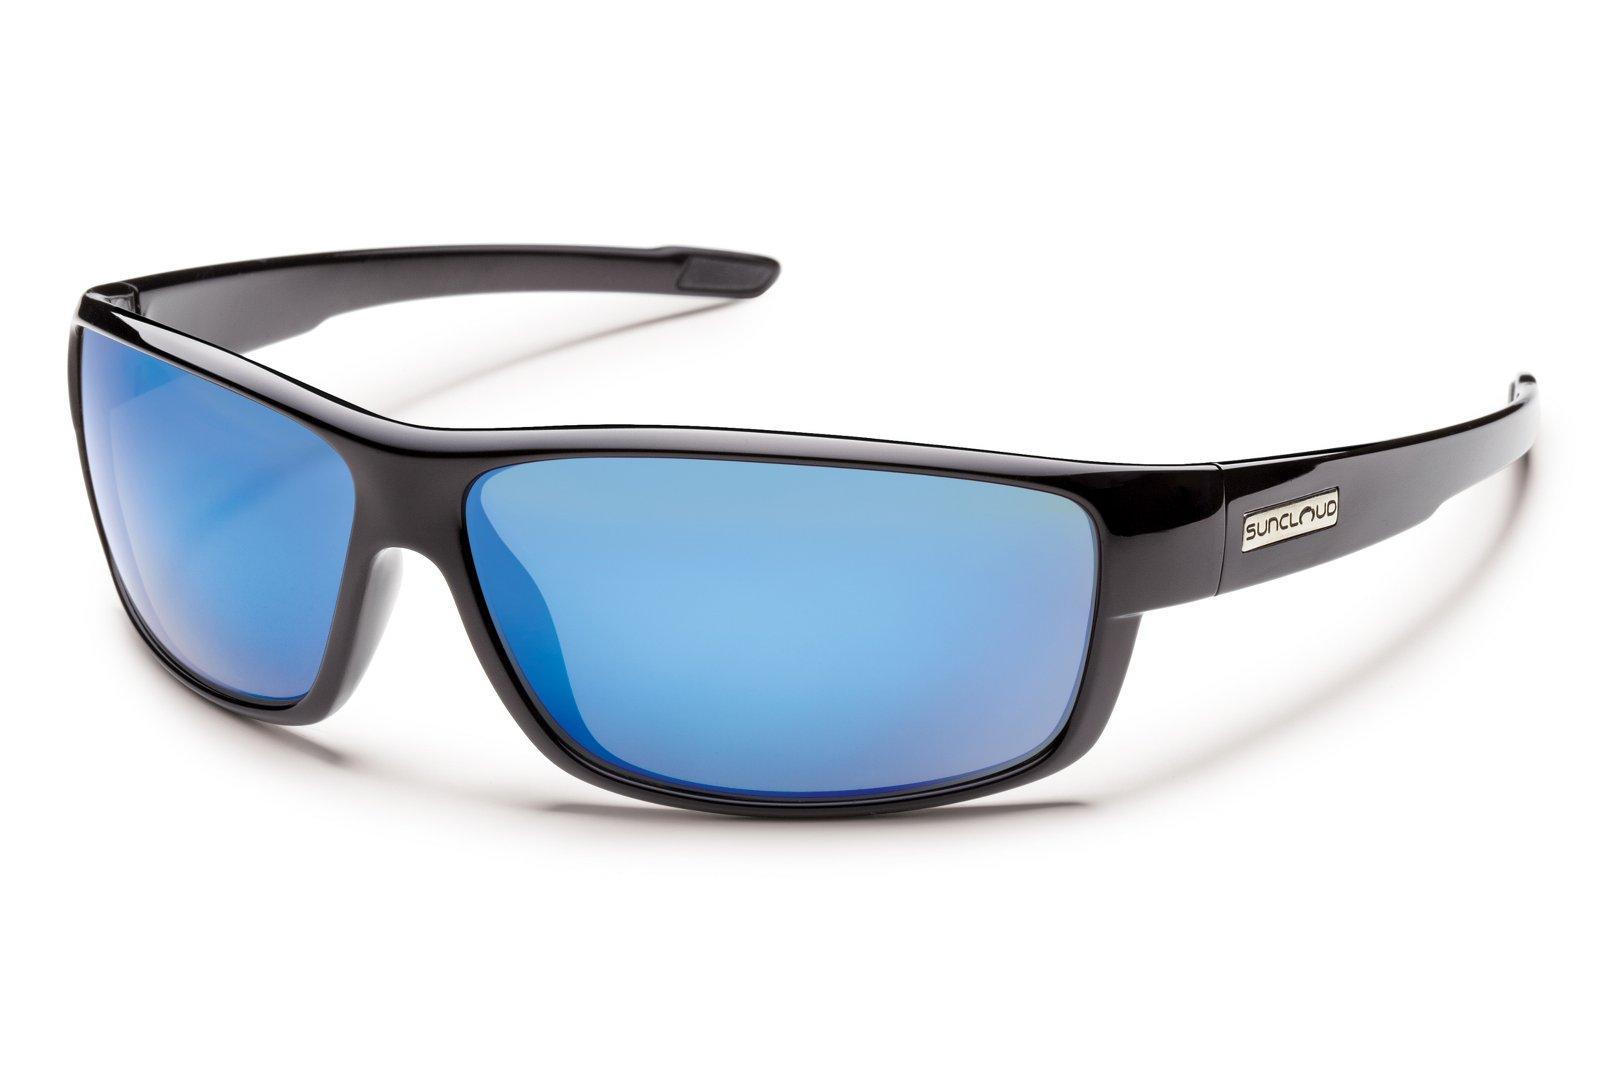 35c0962fb8 Suncloud Voucher Sunglasses - AvidMax